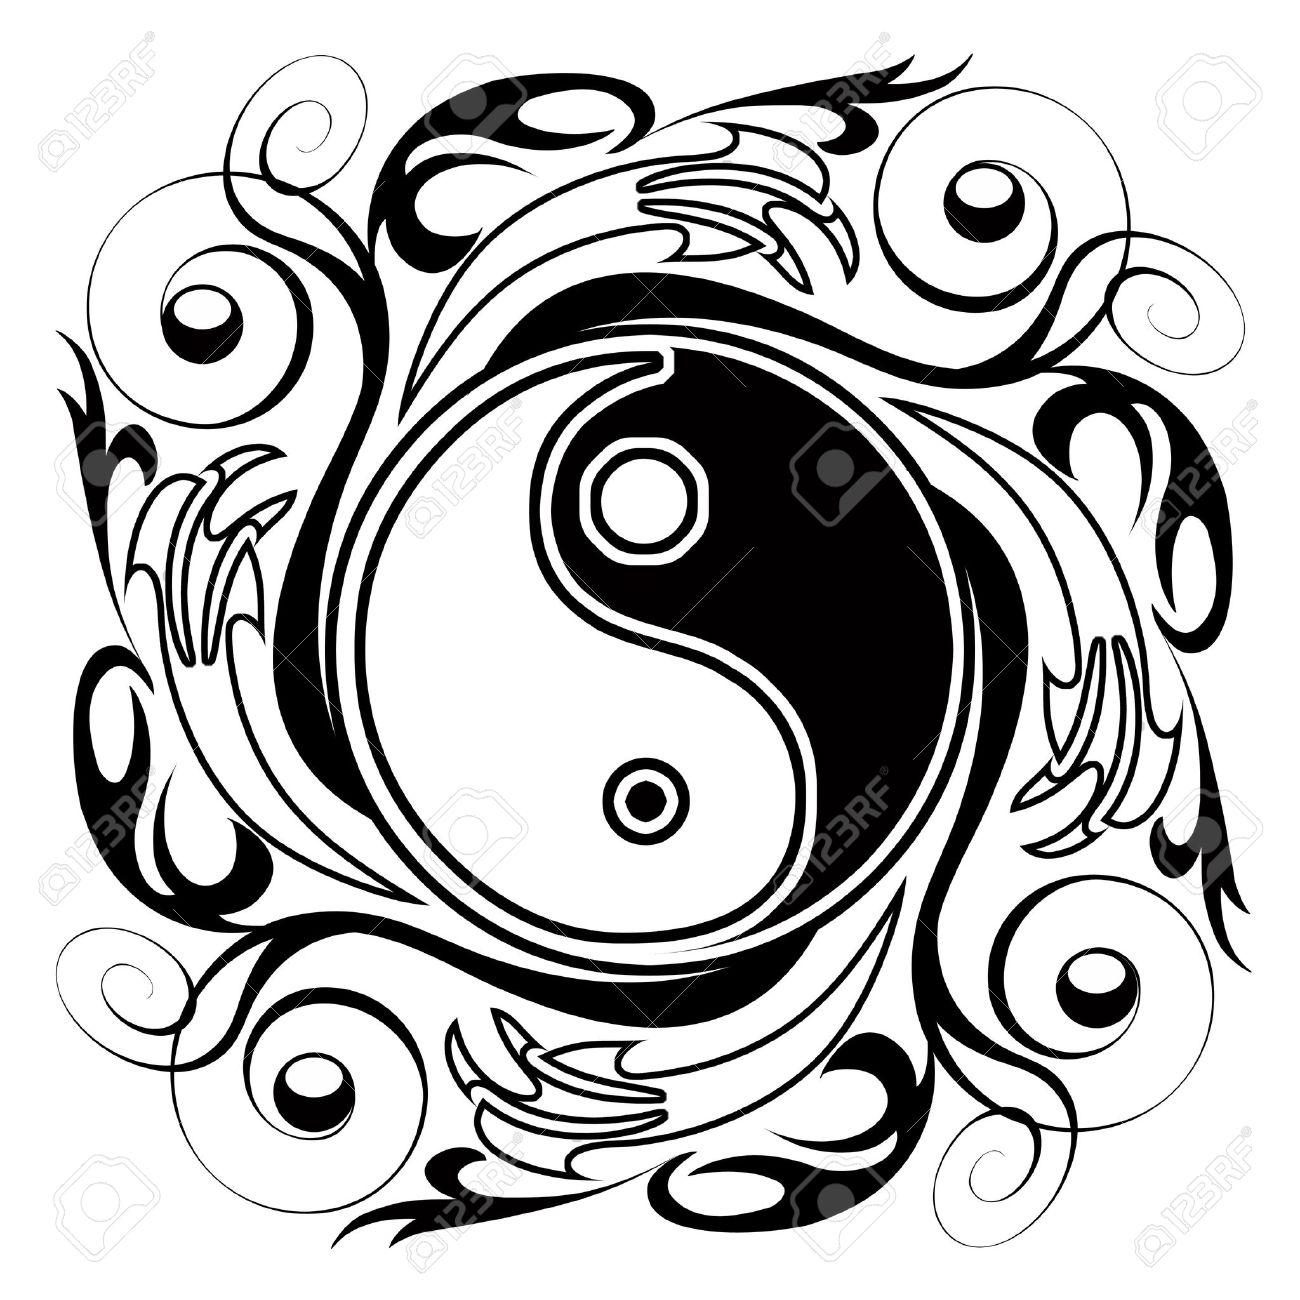 1300x1300 Yin Amp Yang Ornamental Tattoo Symbol Stock Photo, Picture